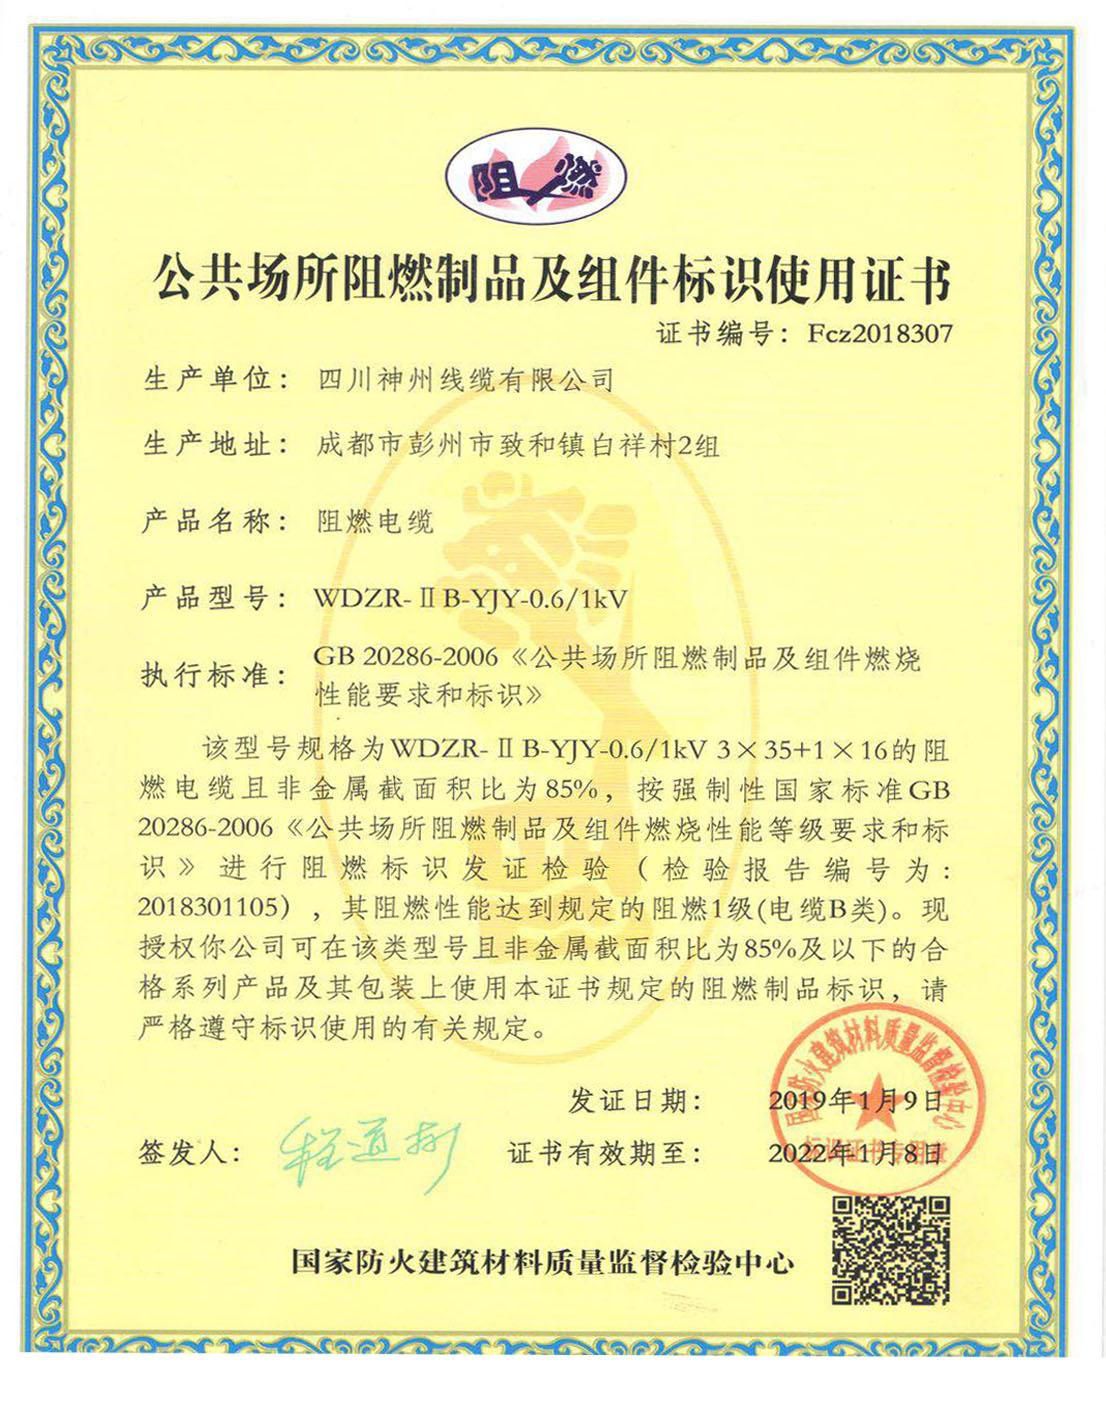 P好证书-0cc49b50-60c7-462c-9ee8-96e6efc76efd